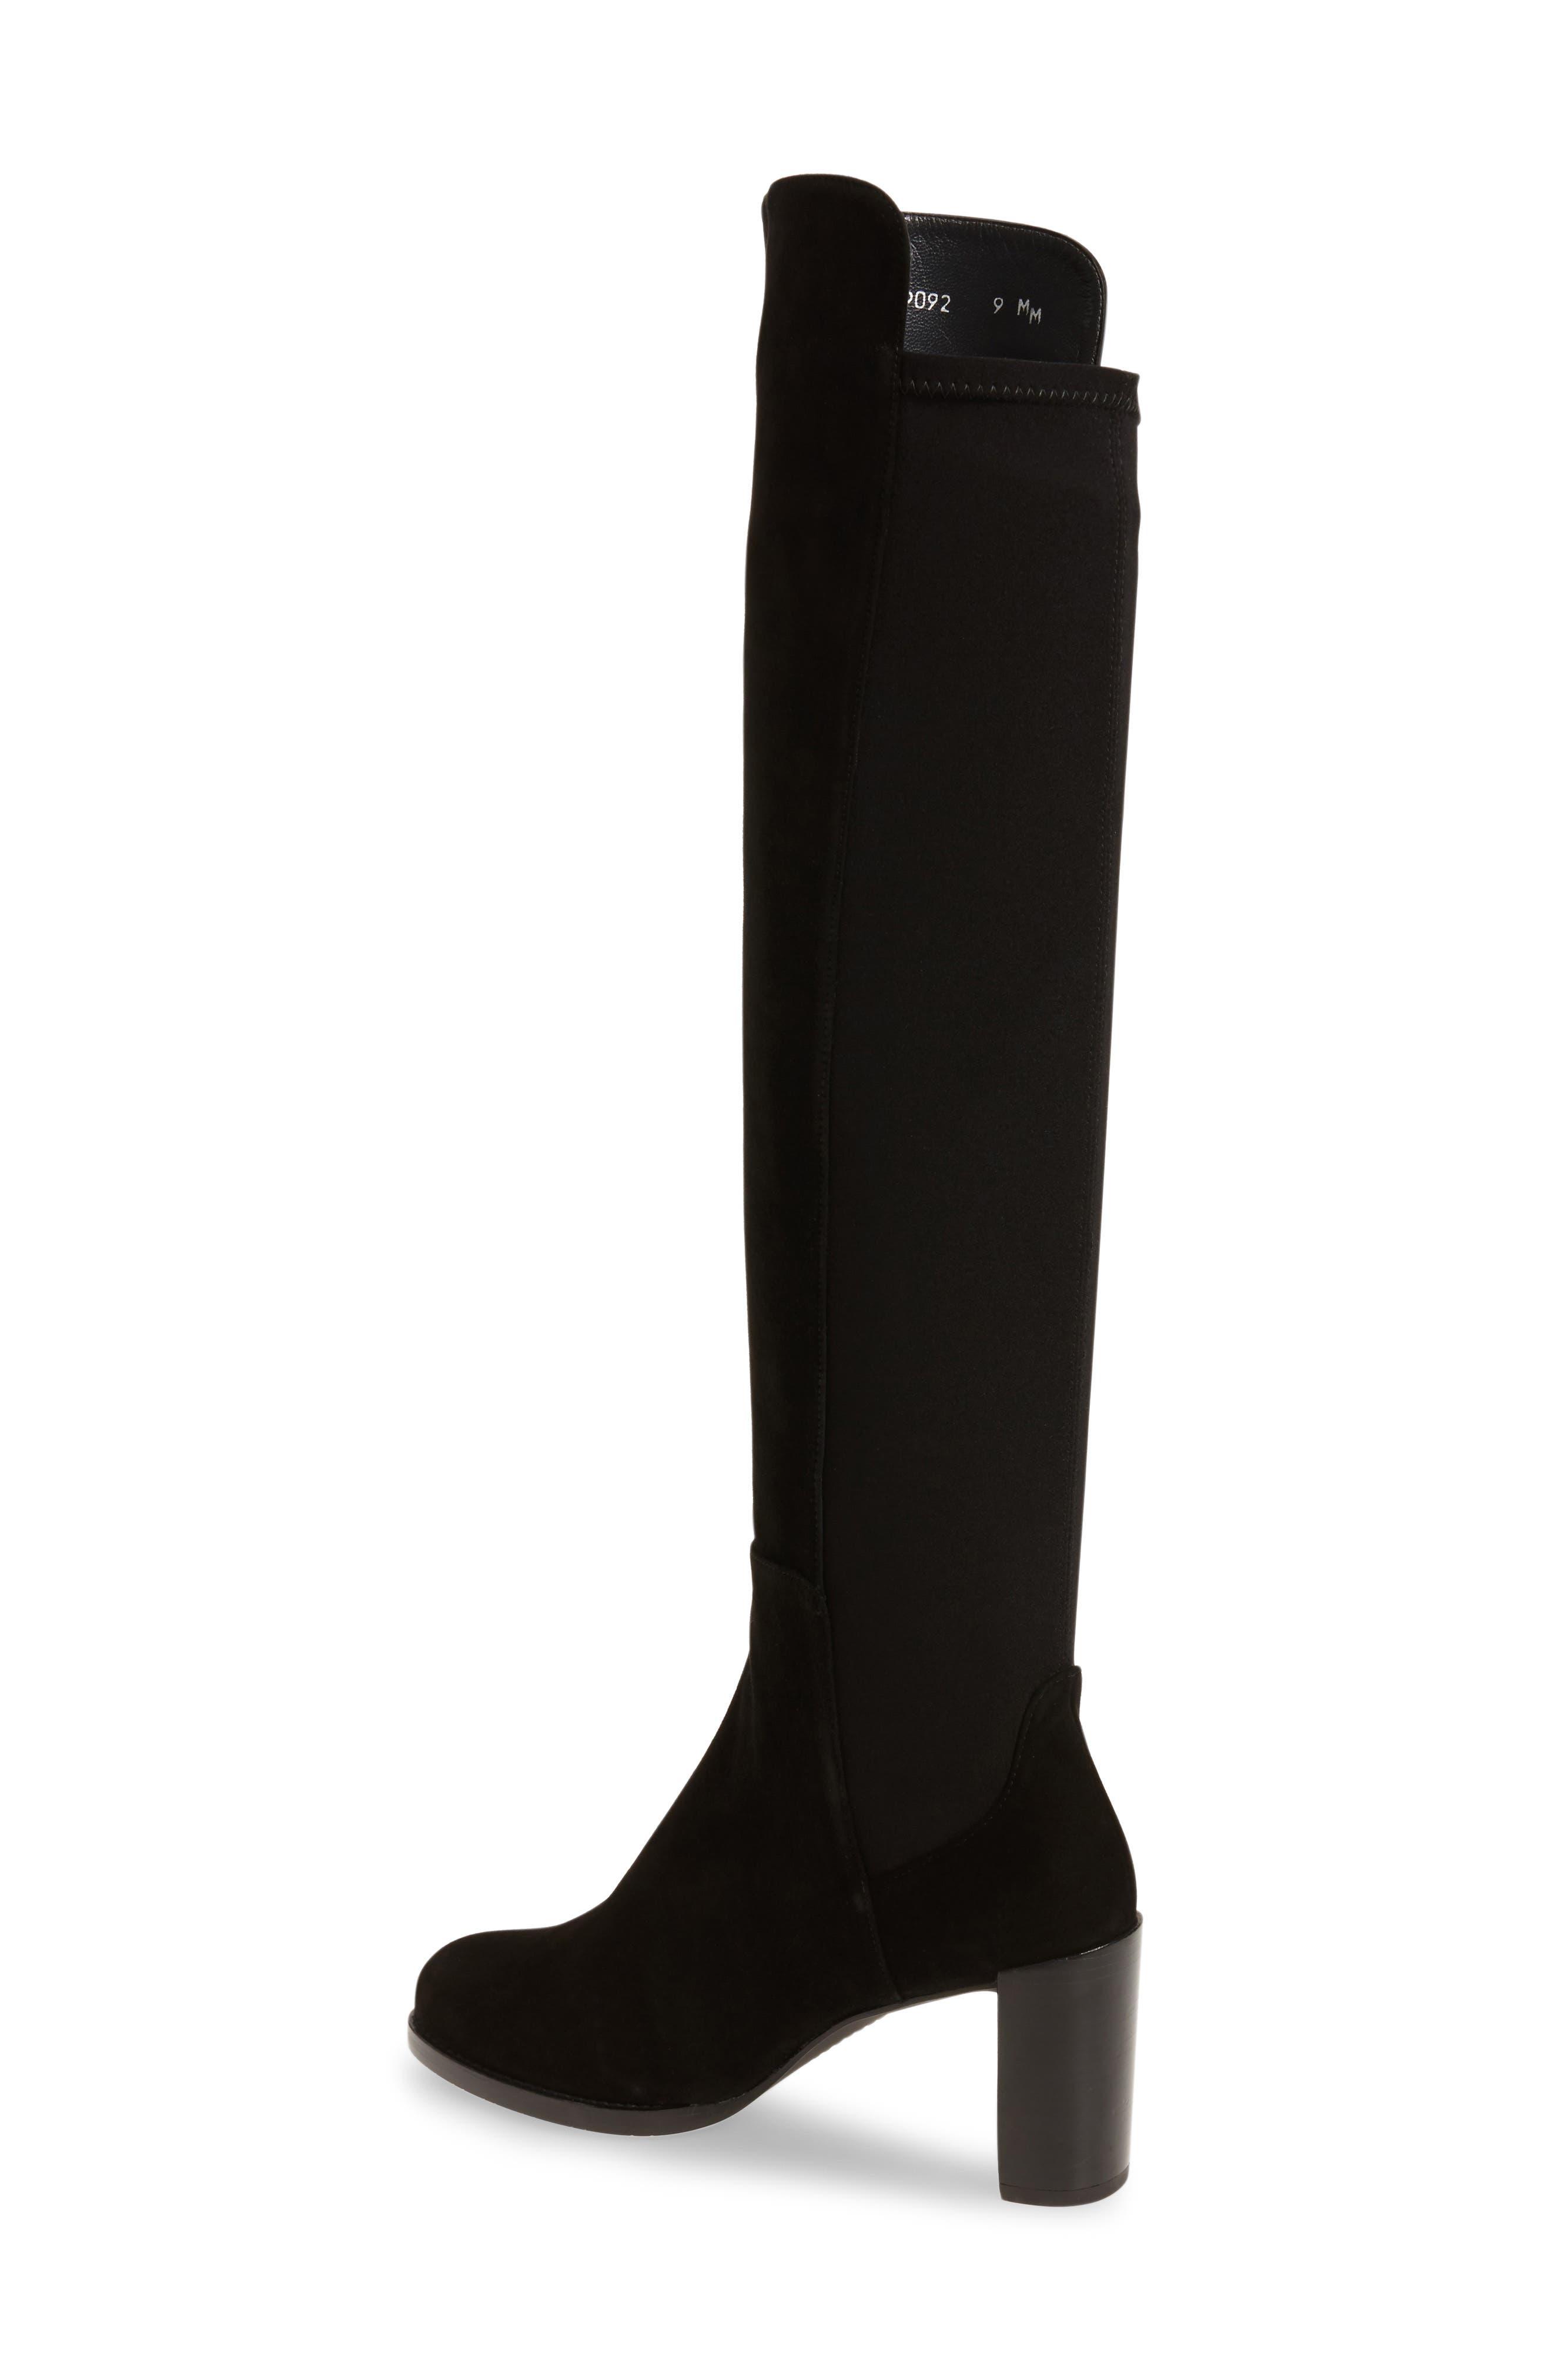 Alternate Image 2  - Stuart Weitzman 'Soho' Tall Elastic Back Boot (Women) (Nordstrom Exclusive)